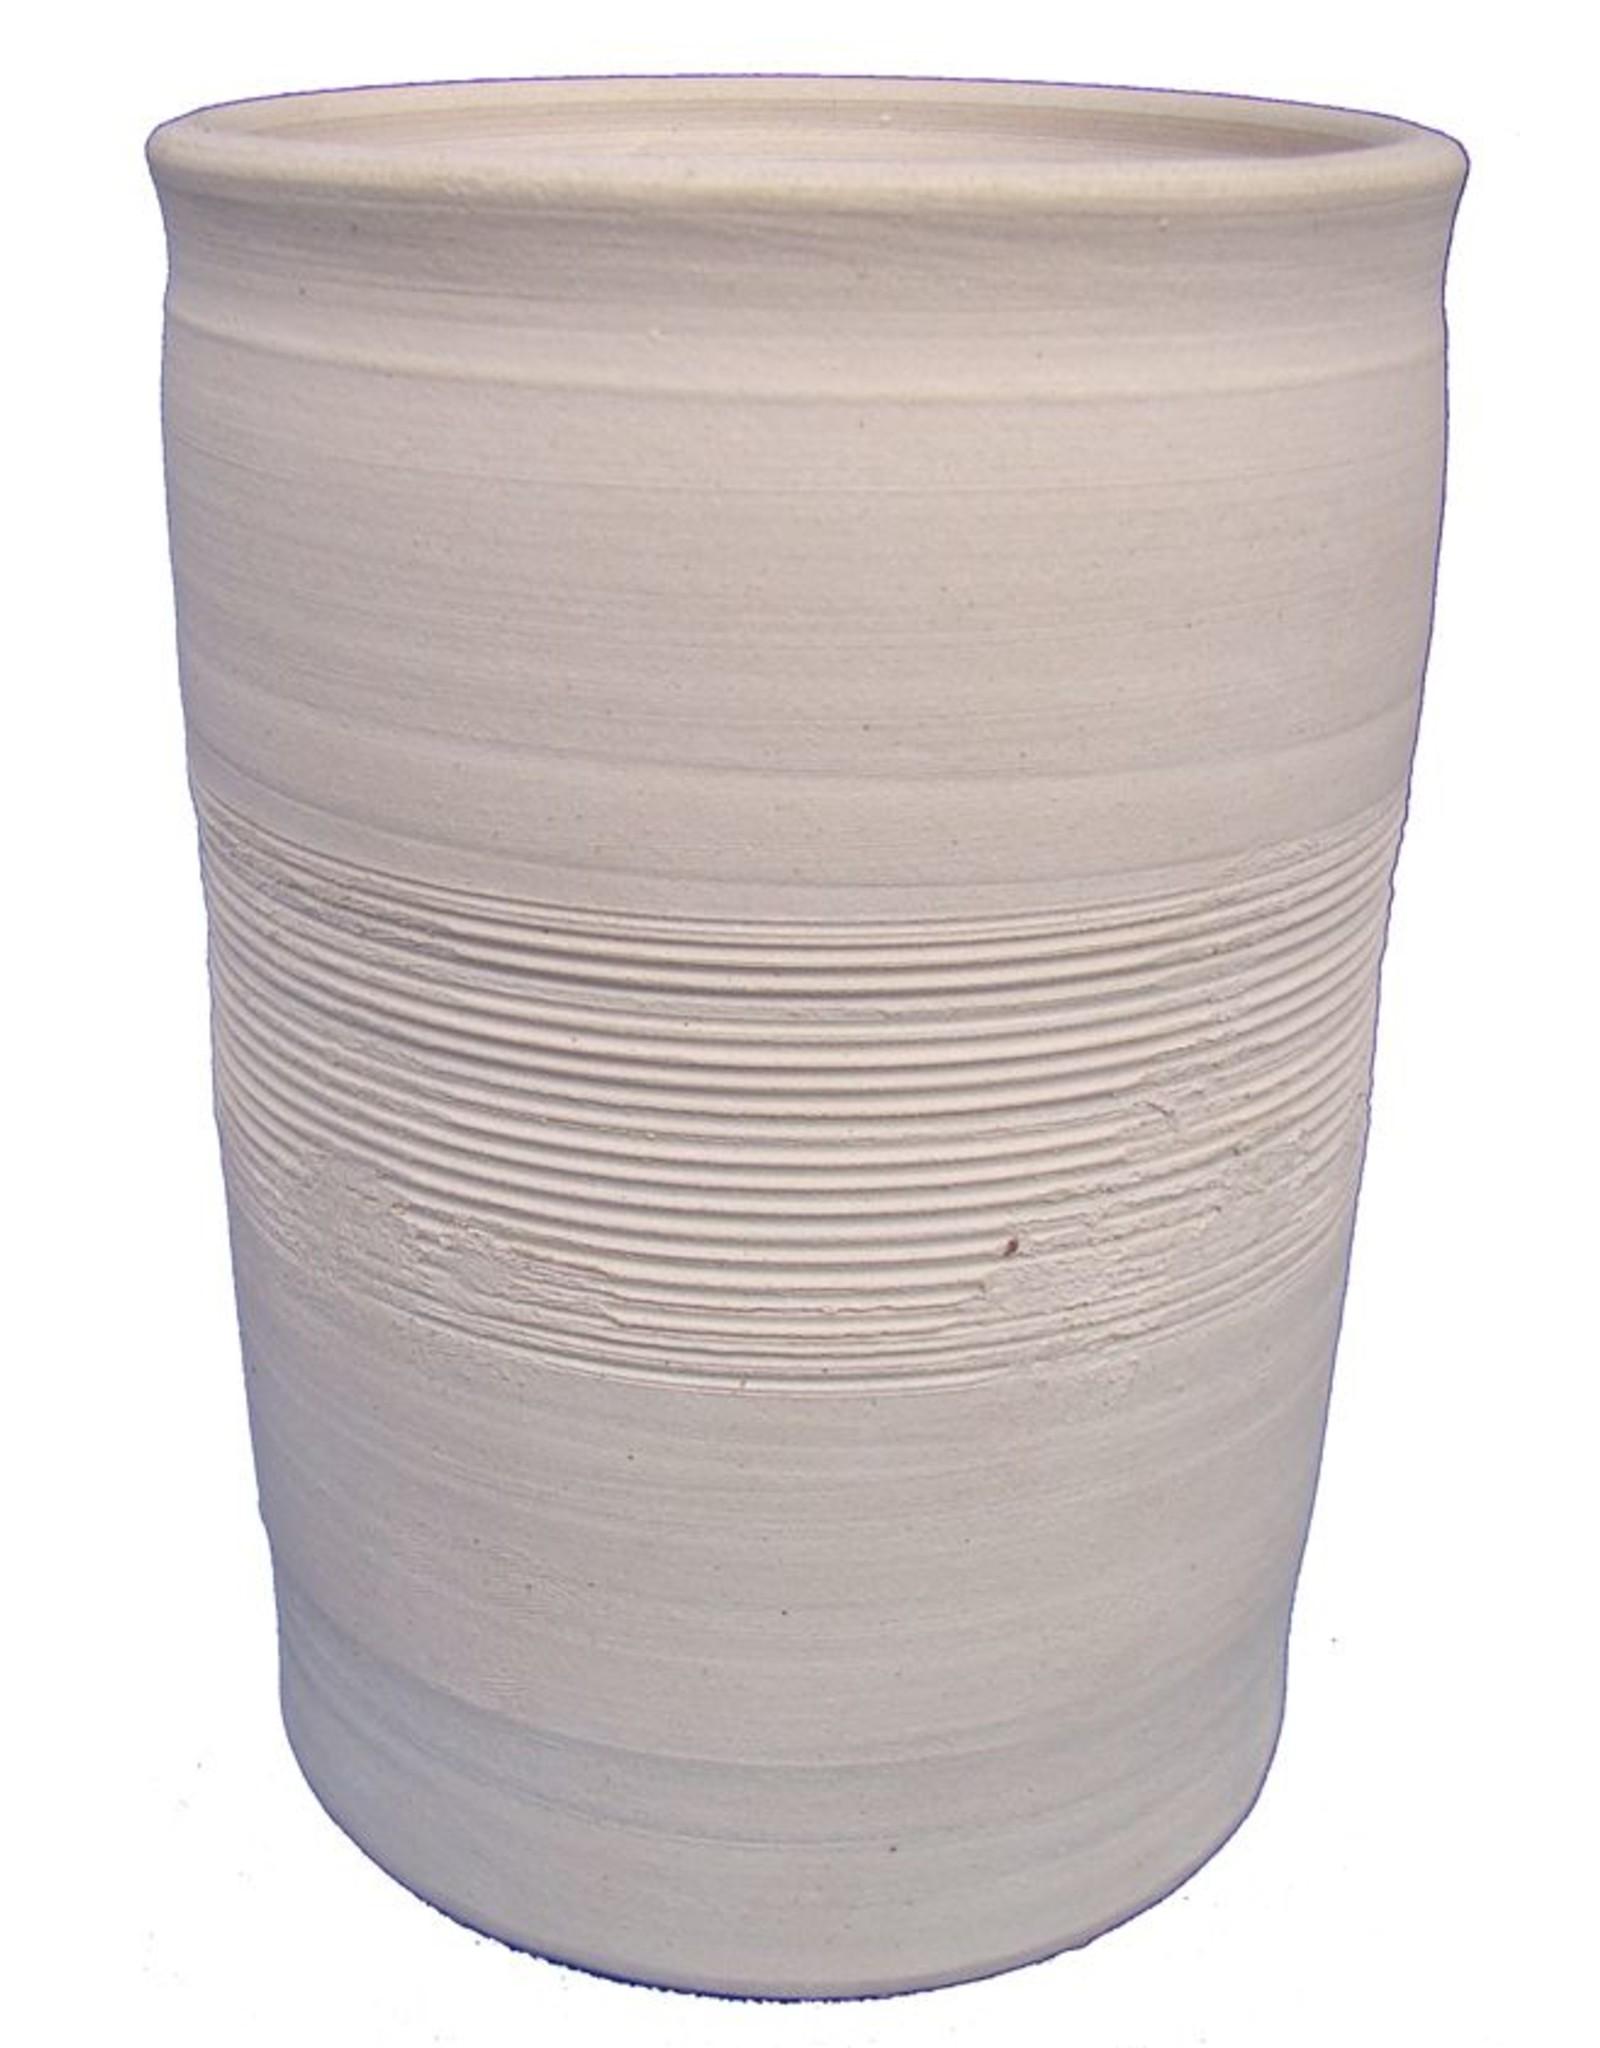 Potclays 1142 White Special Stoneware (Firing Range 1200˚C-1300˚C) - 12.5kg